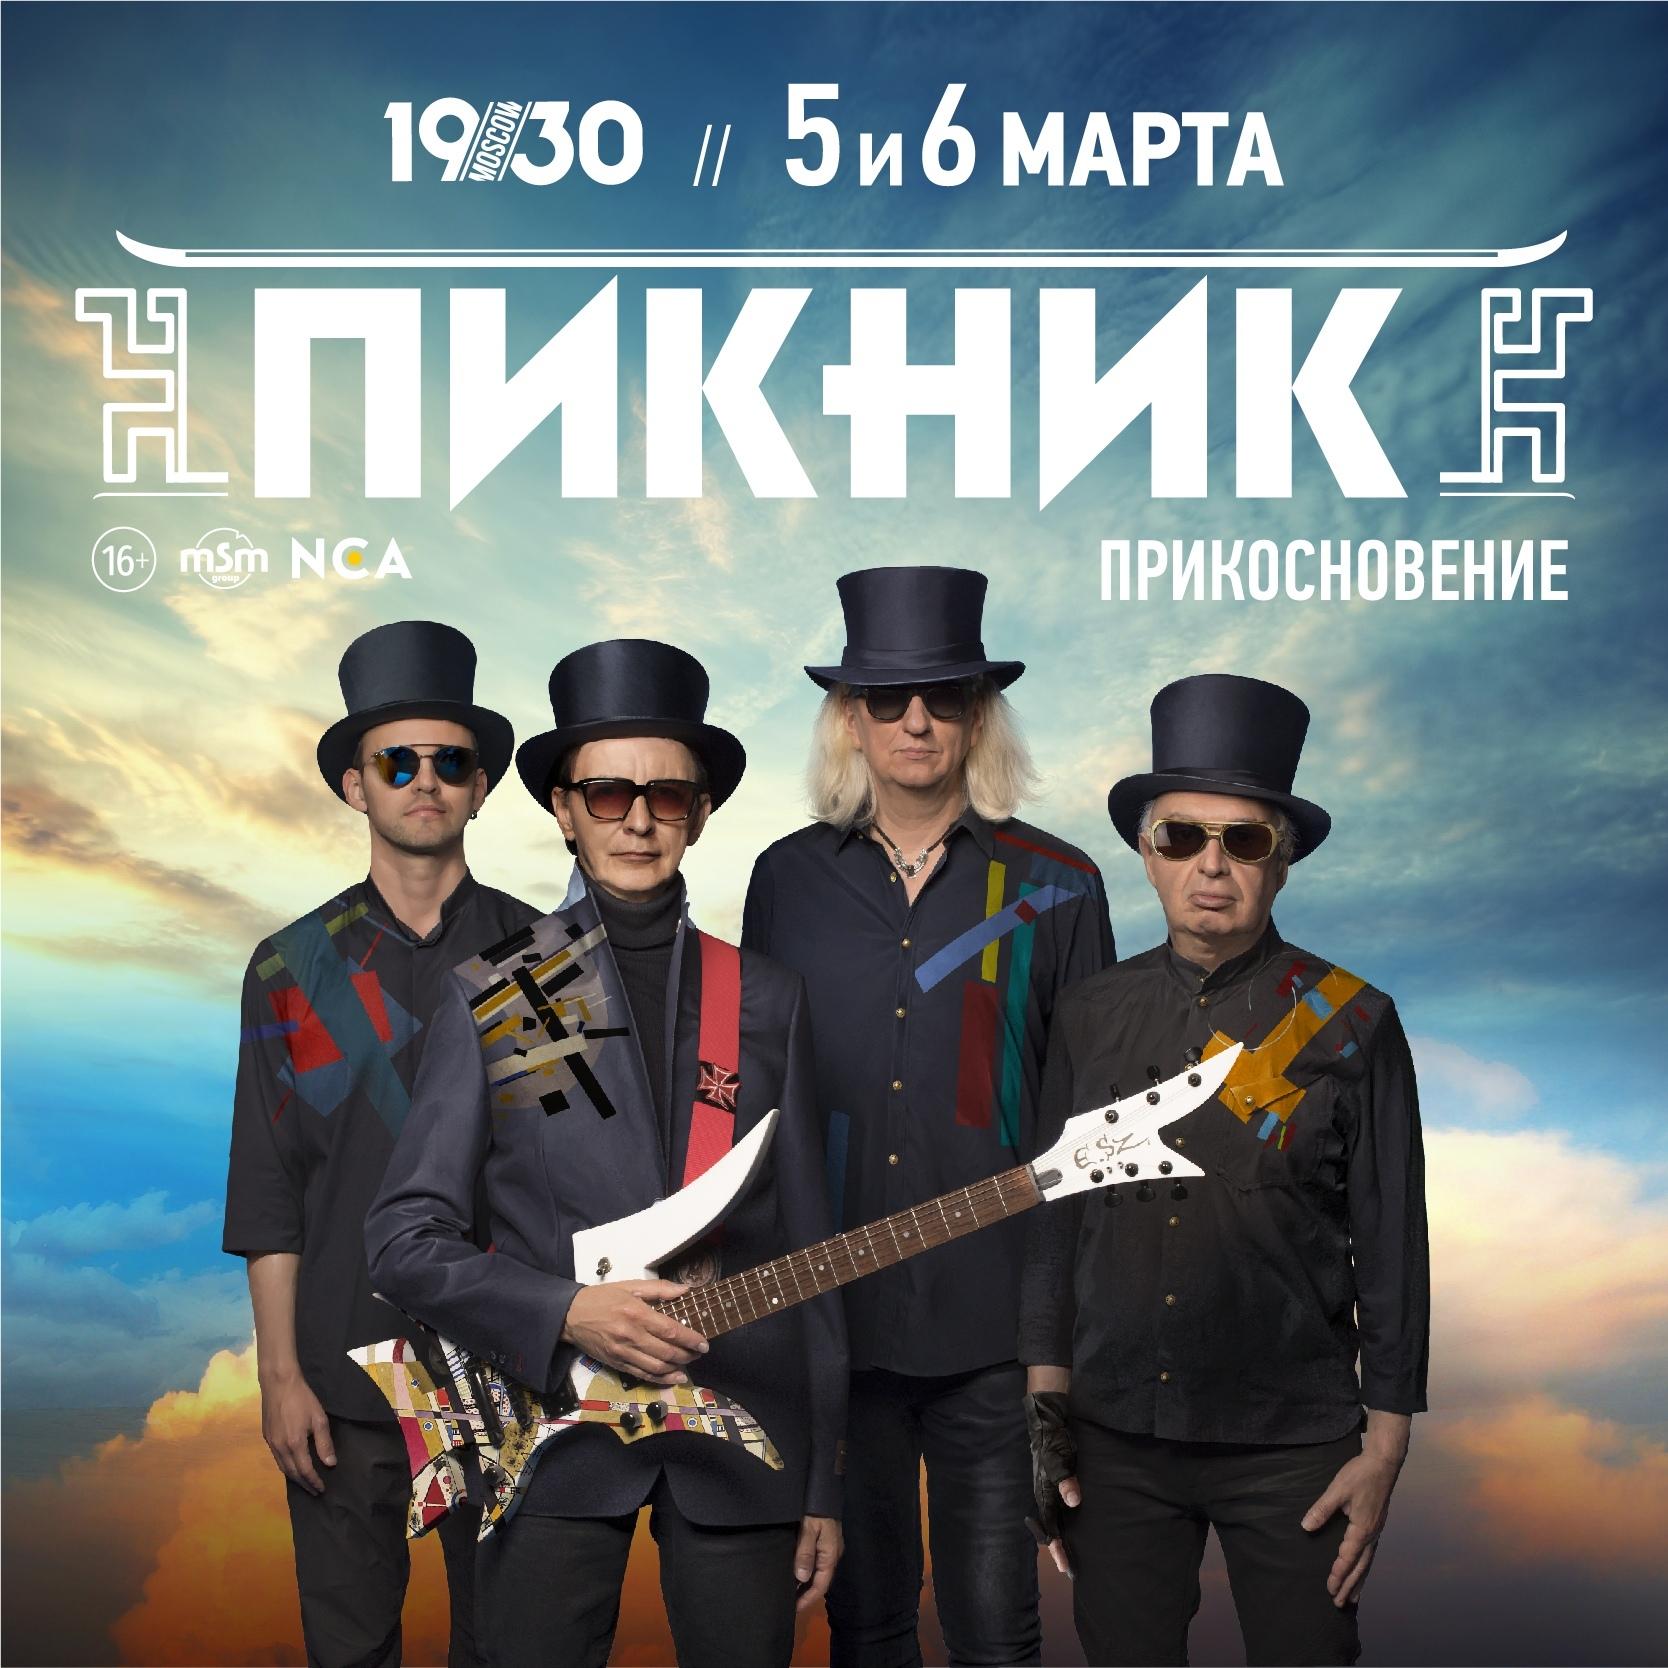 6 марта клуб москва